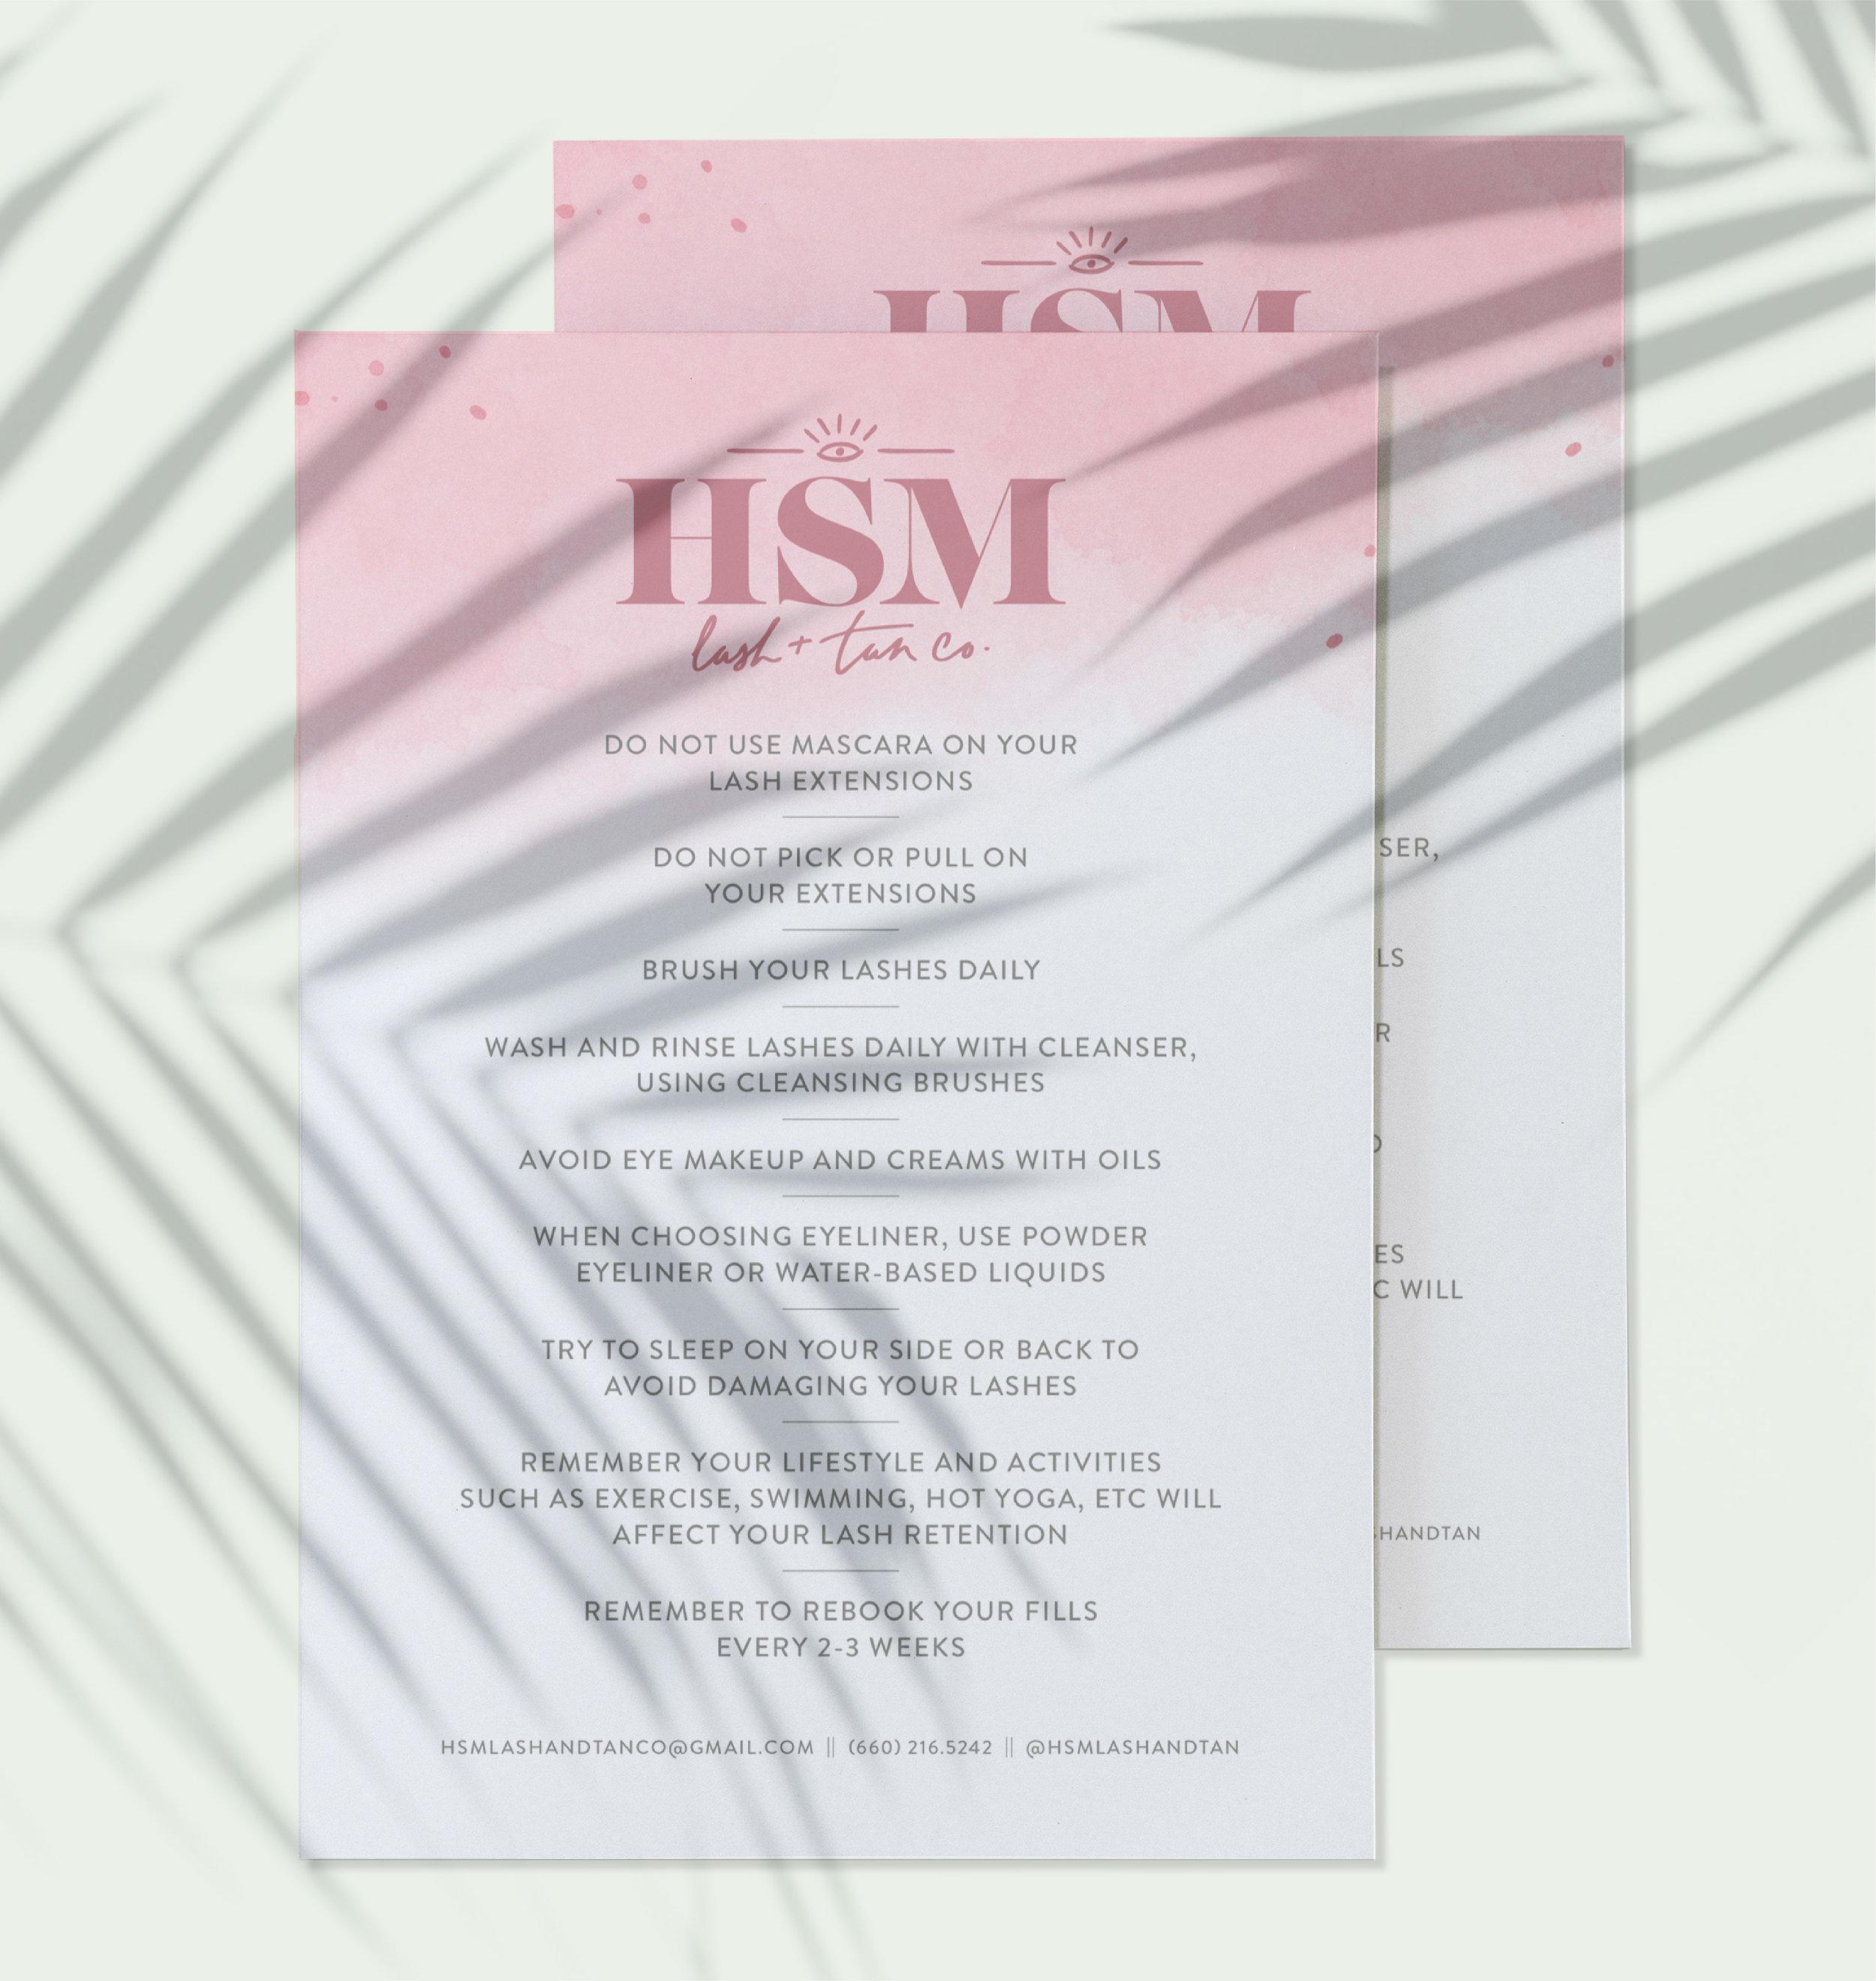 hsm card-16.jpg